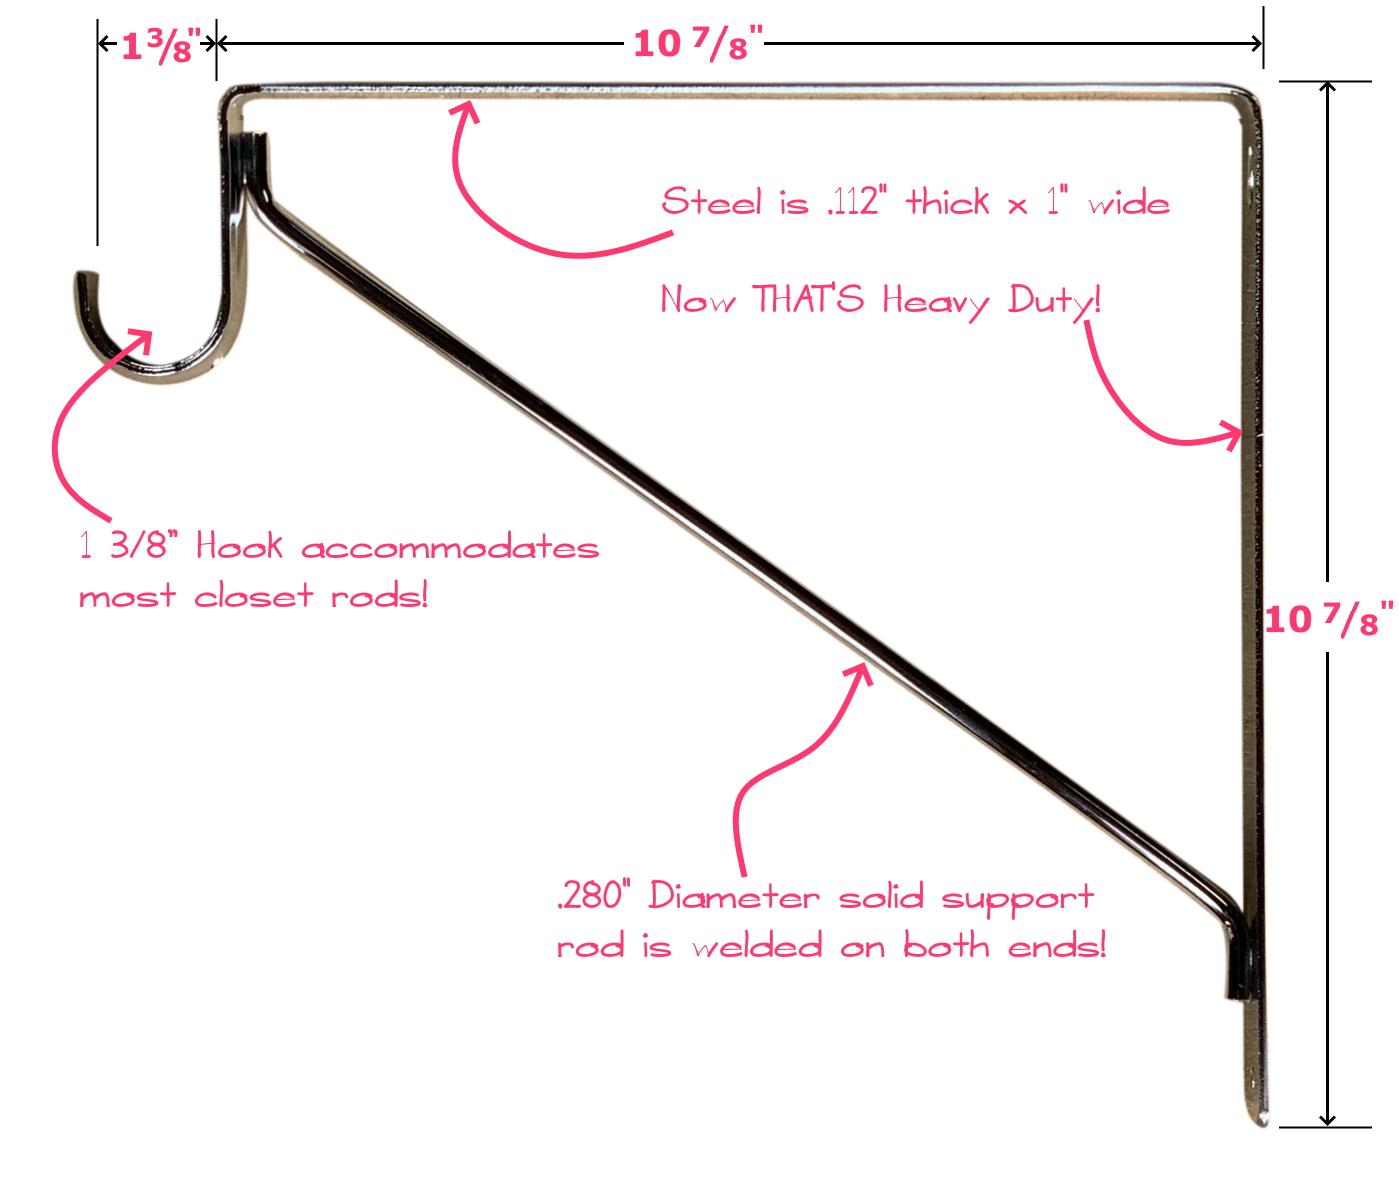 Fixed Closet Shelf Bracket for Round Rod - Chrome